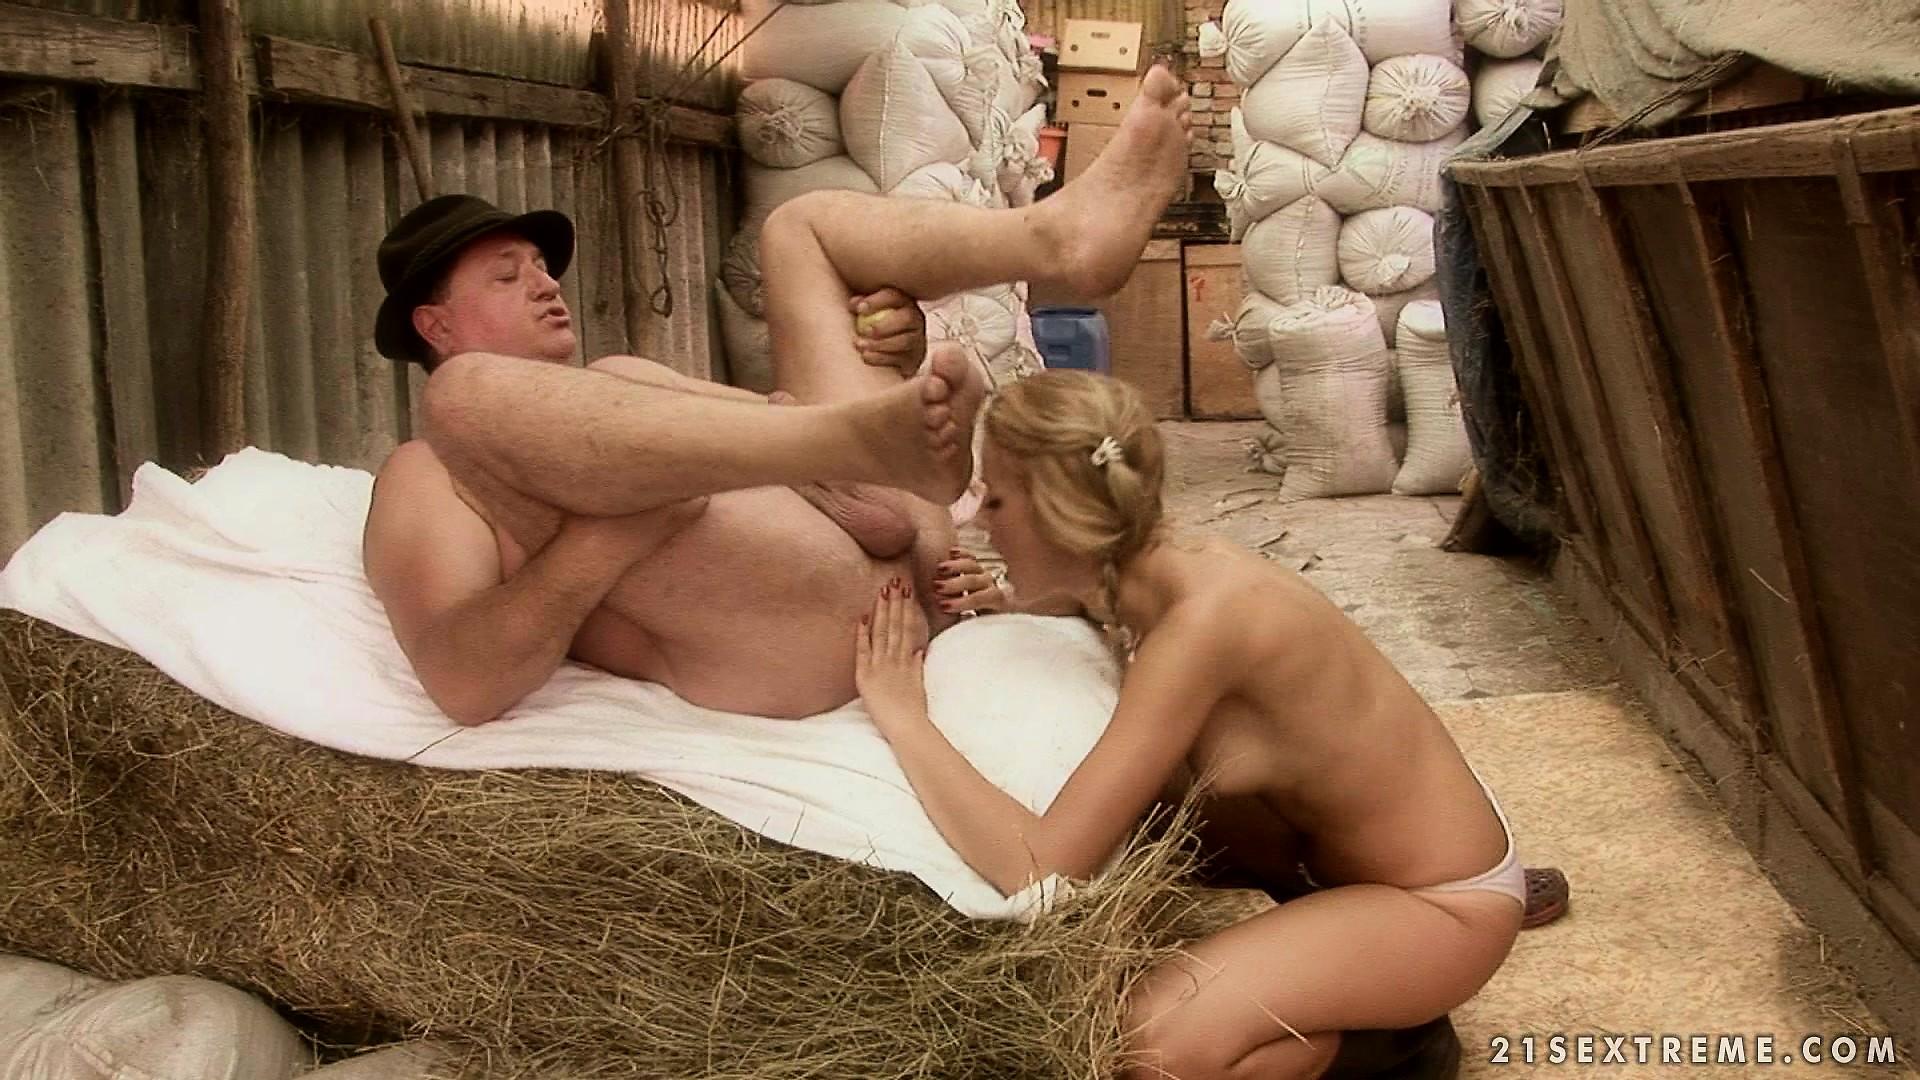 Foto sex woman brazil hot com